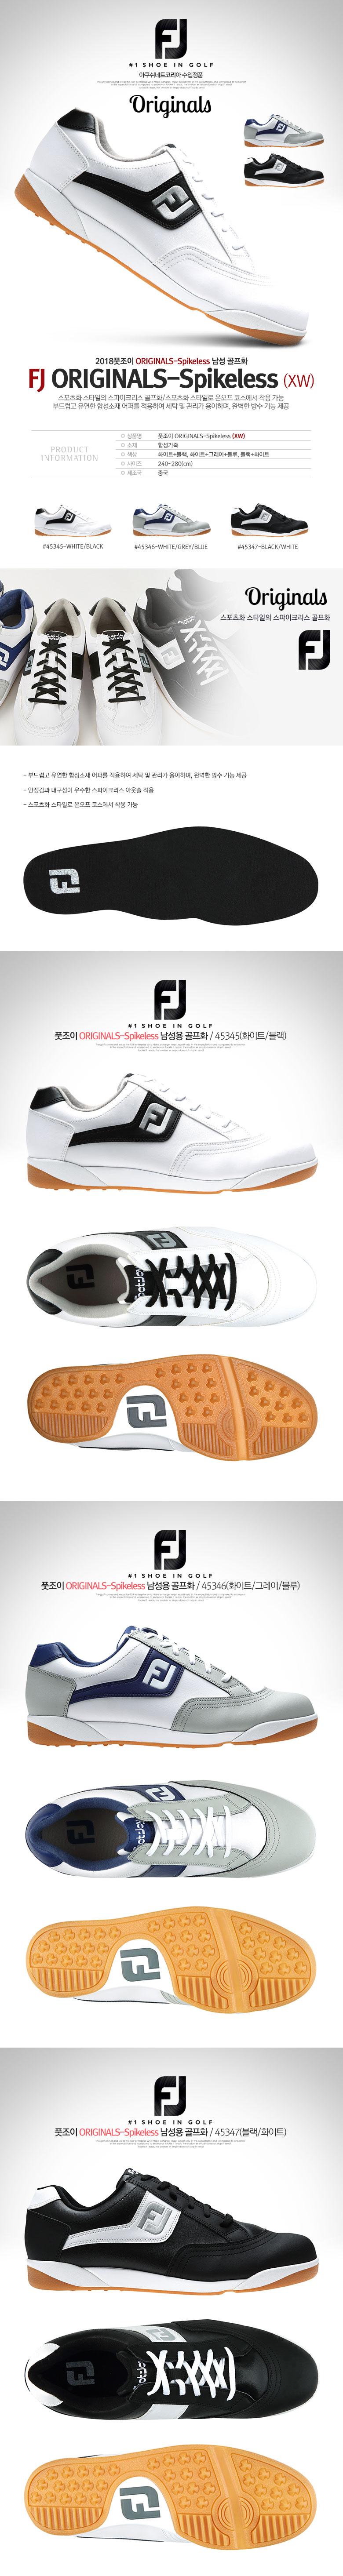 fj_18originals_spikeless_shoes.jpg